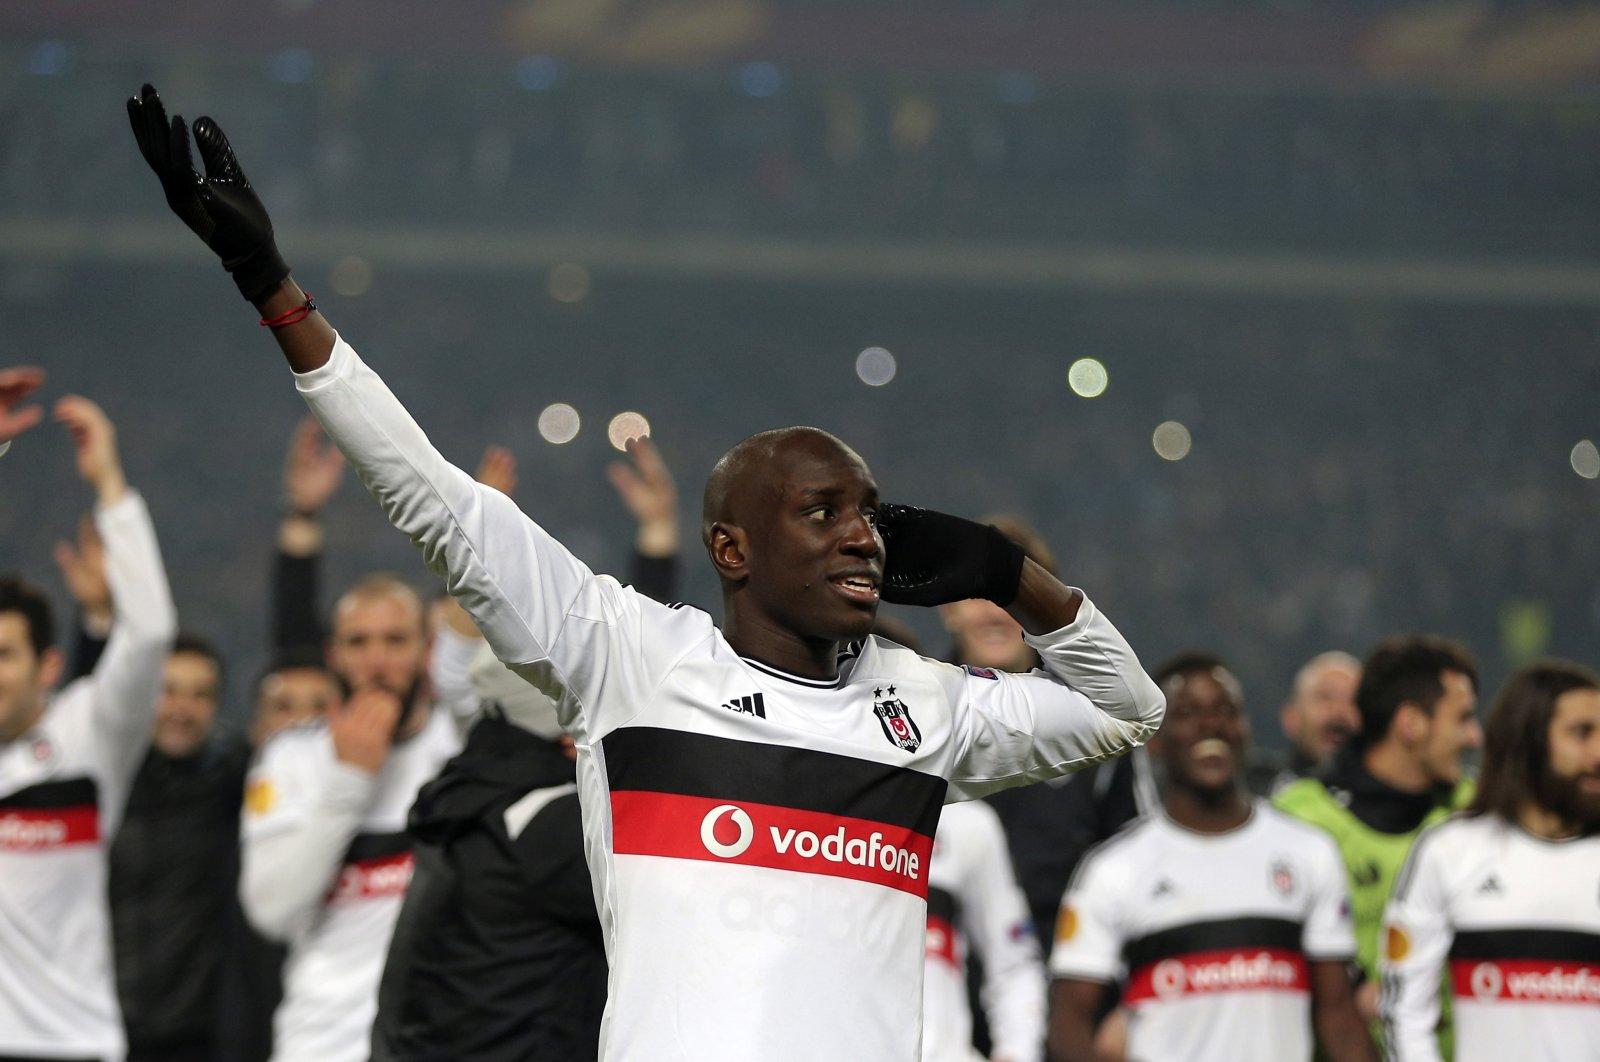 Beşiktaş's Demba Ba reacts after a Europa League match against Liverpool, Atatürk Olympic Stadium in Istanbul, Turkey, Feb. 26, 2015. (AP Photo)